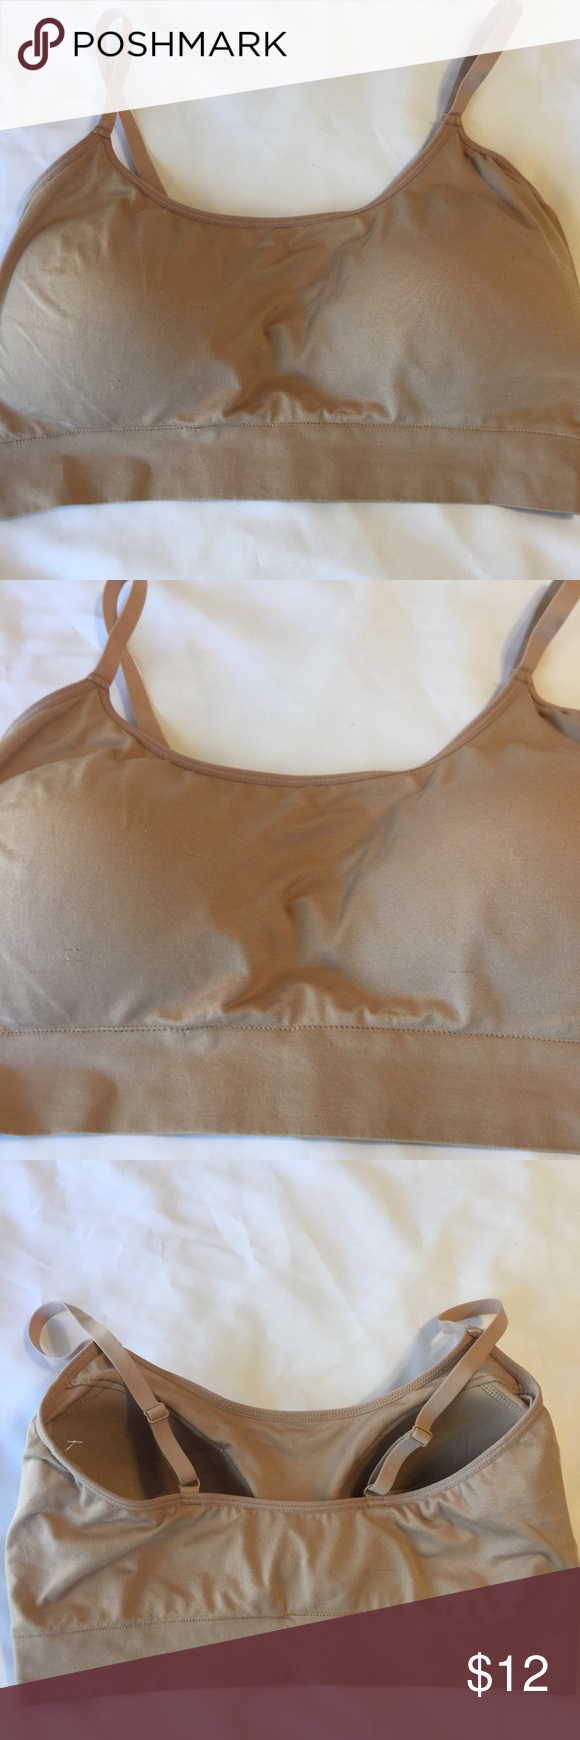 XL Beige Sports Bra. Gilligan & O'Malley XL Beige Sports Bra. Never worn but does have a few snags in it. Gilligan & O'Malley Intimates & Sleepwear Bras